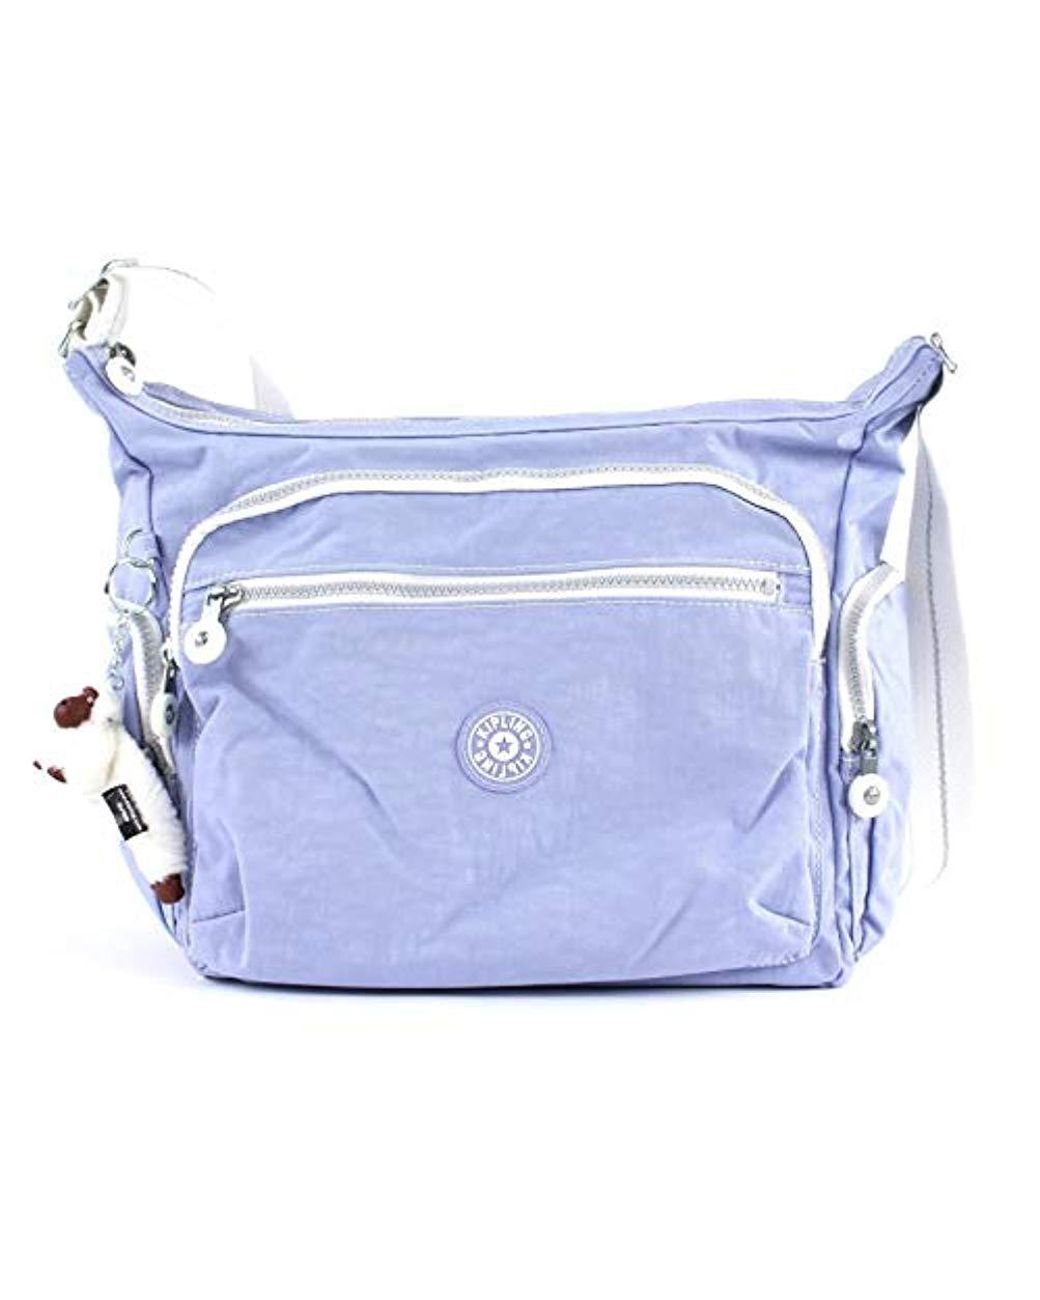 e1dfdb2532 Kipling Gabbie Shoulder Bag in Purple - Lyst